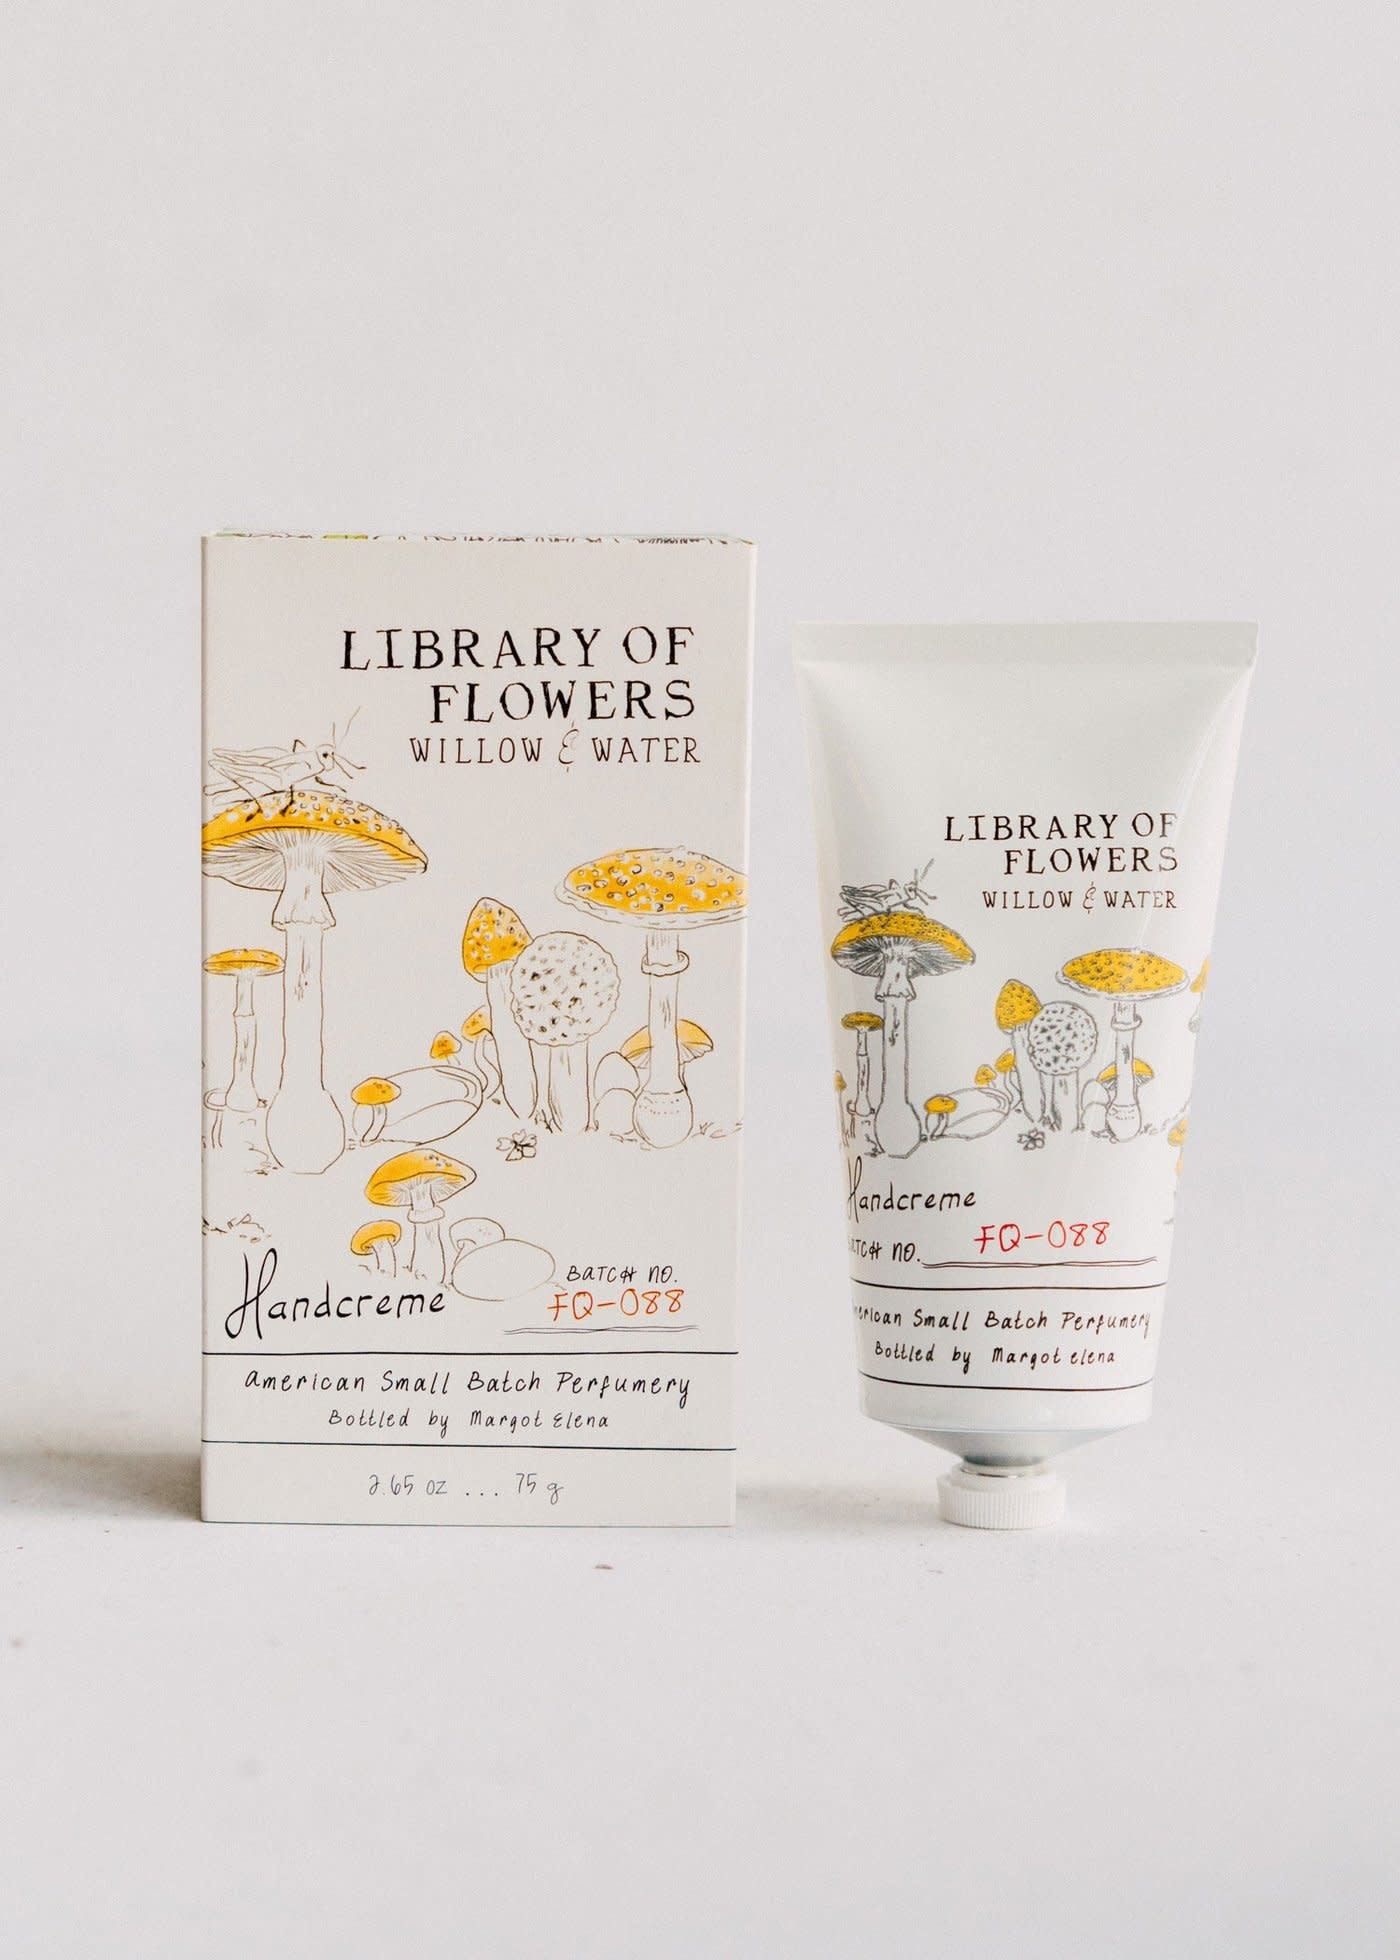 Margot Elena / Burwell Library of Flowers Handcreme / Willow & Water